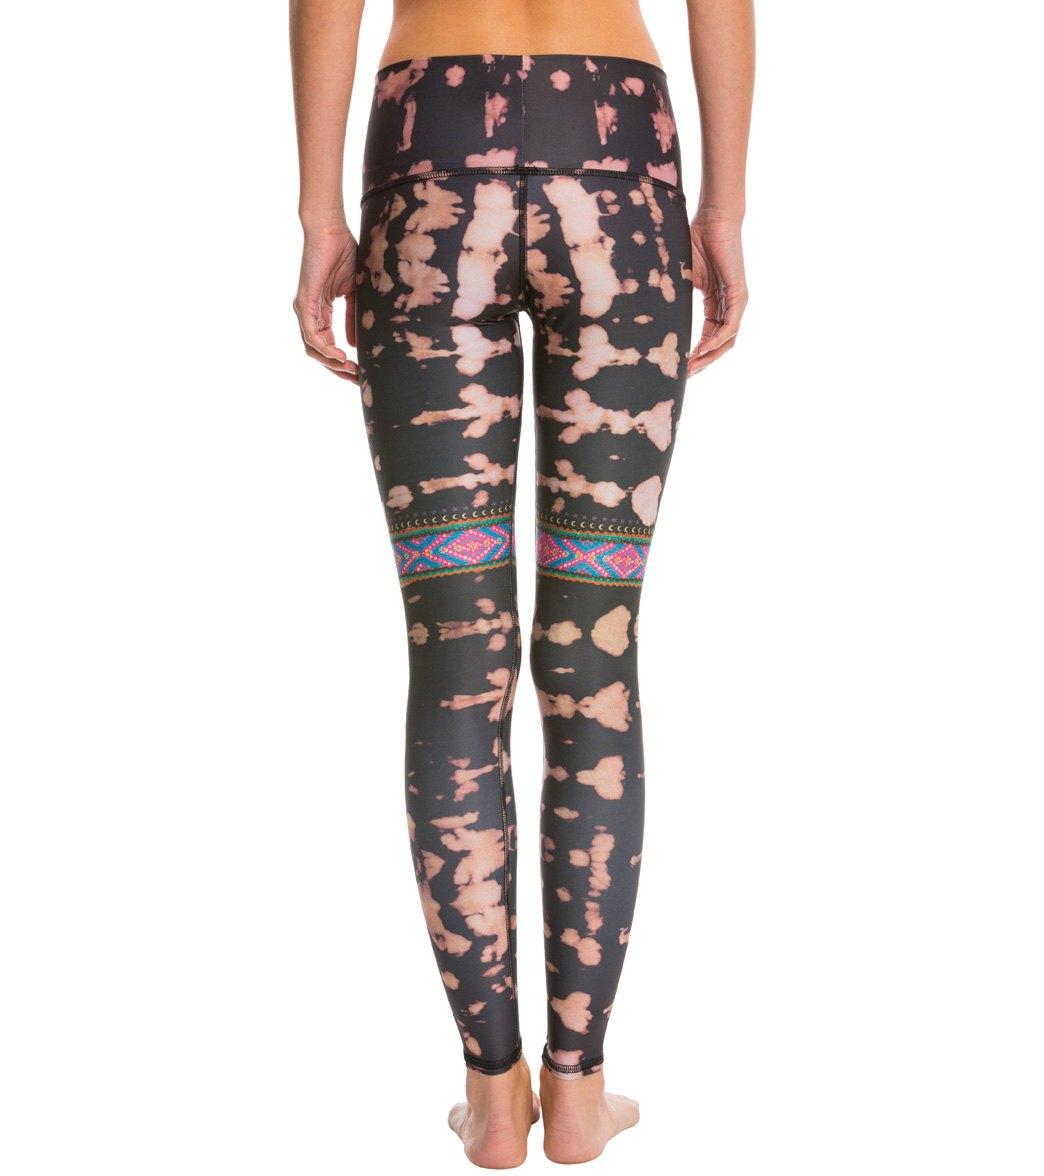 30047fde92 Teeki Cusco Rambler Hot Pants at YogaOutlet.com - Free Shipping